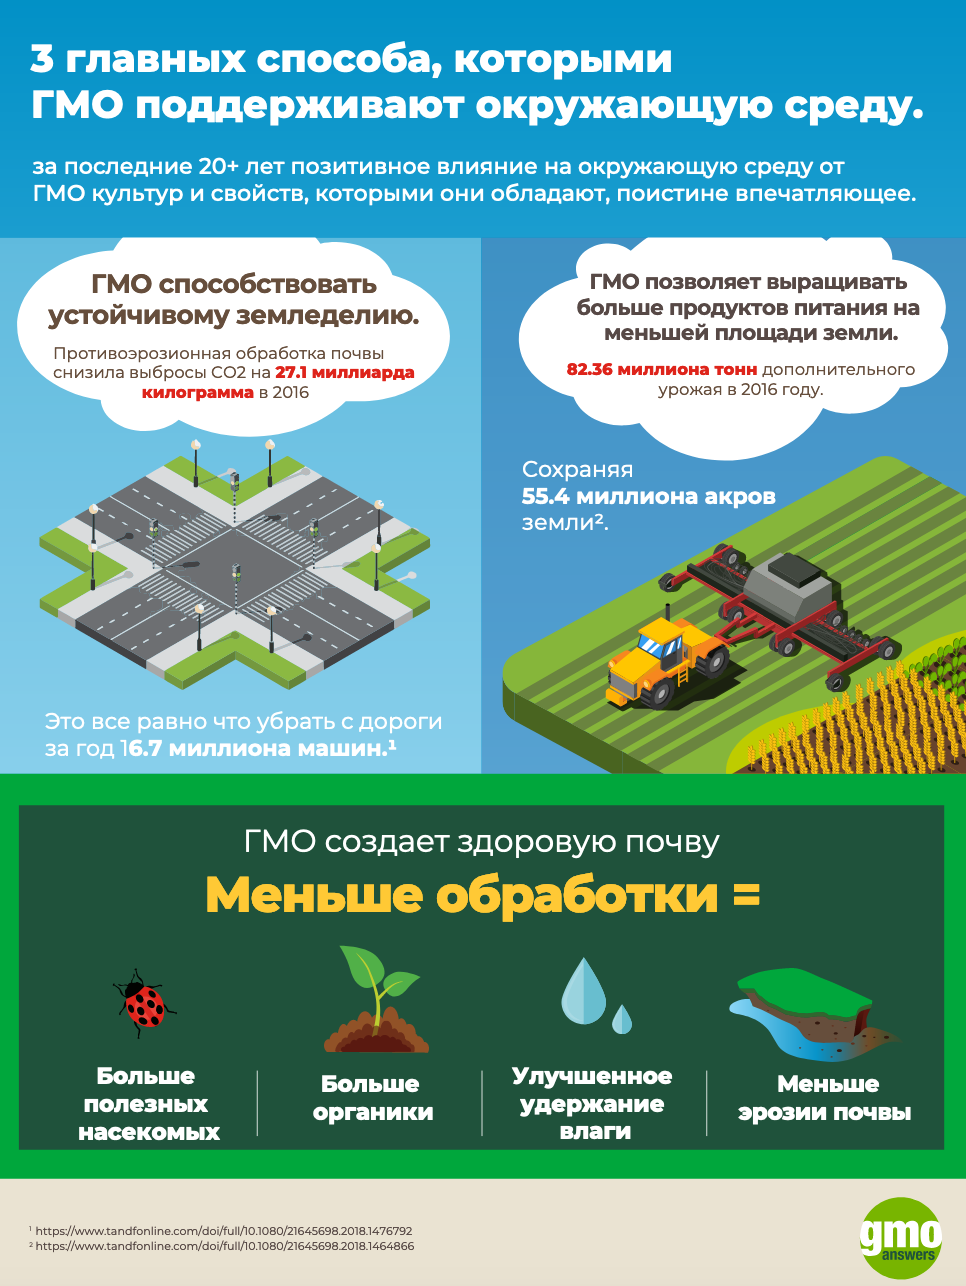 3 Big Ways GMOs Help